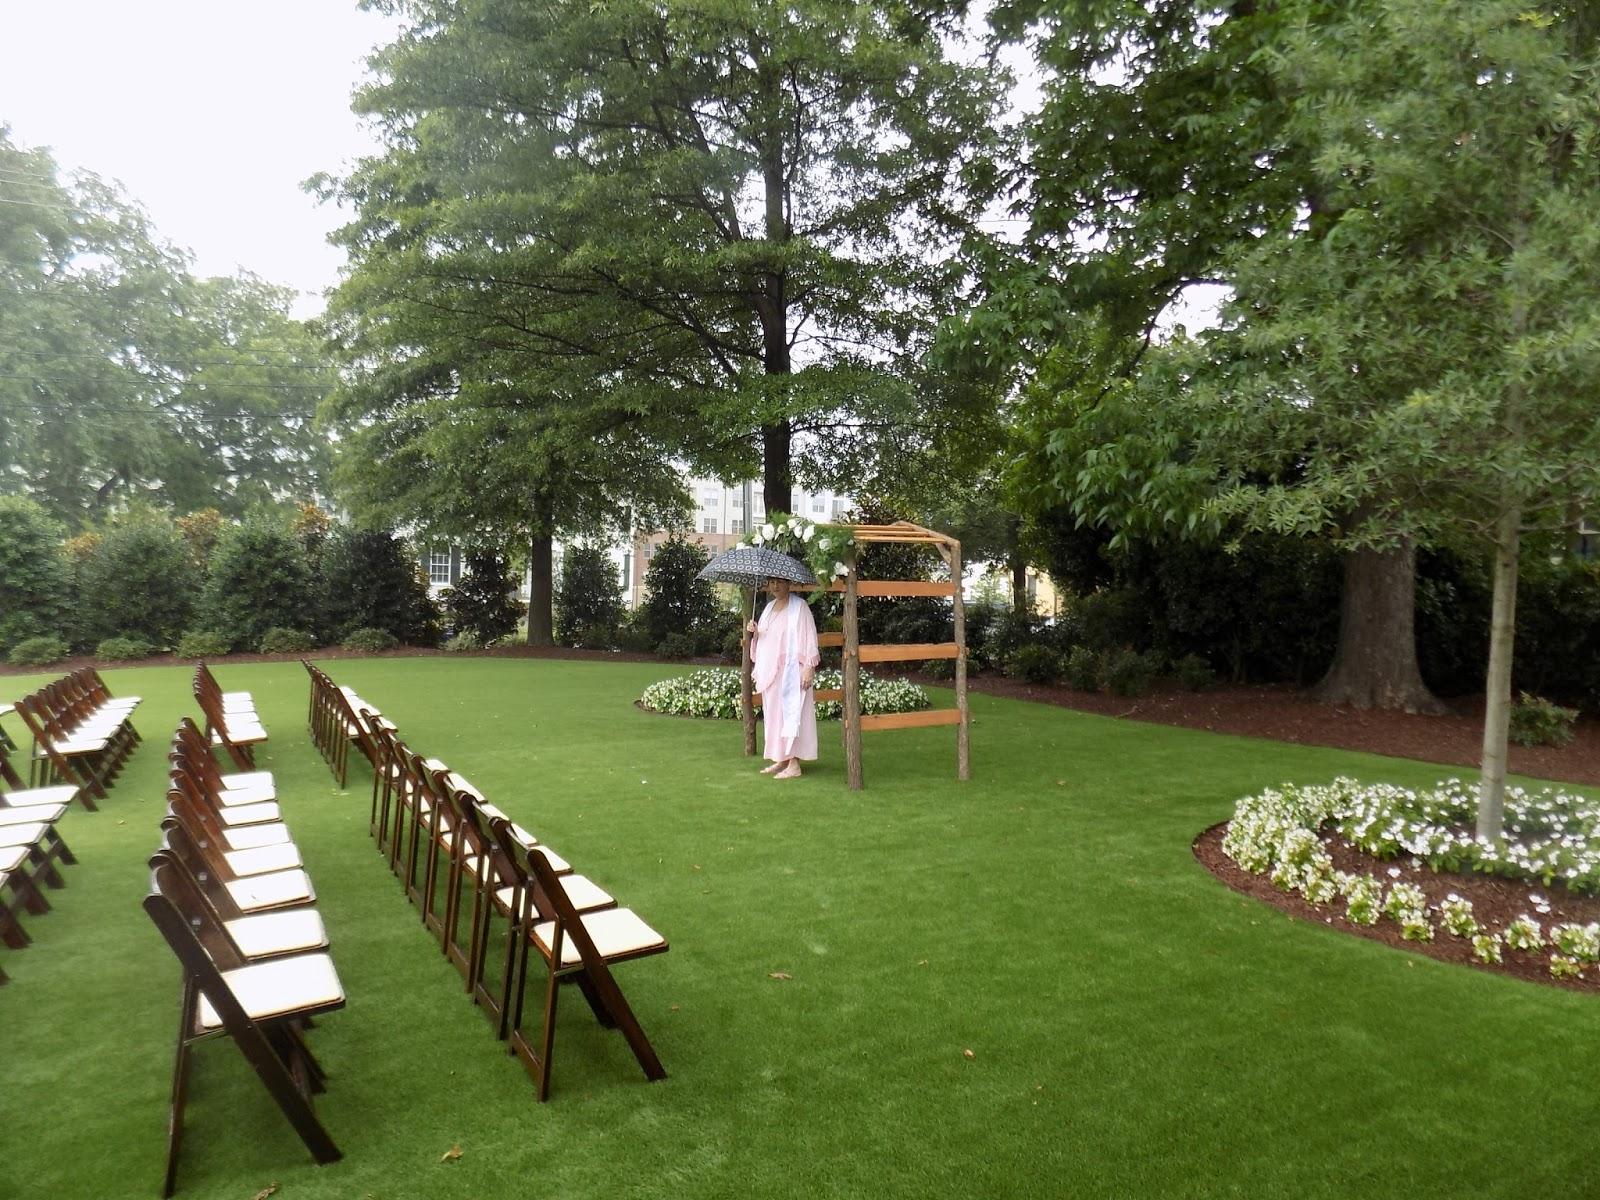 raleigh wedding blog annika and brandon wed at the merrimon wynne